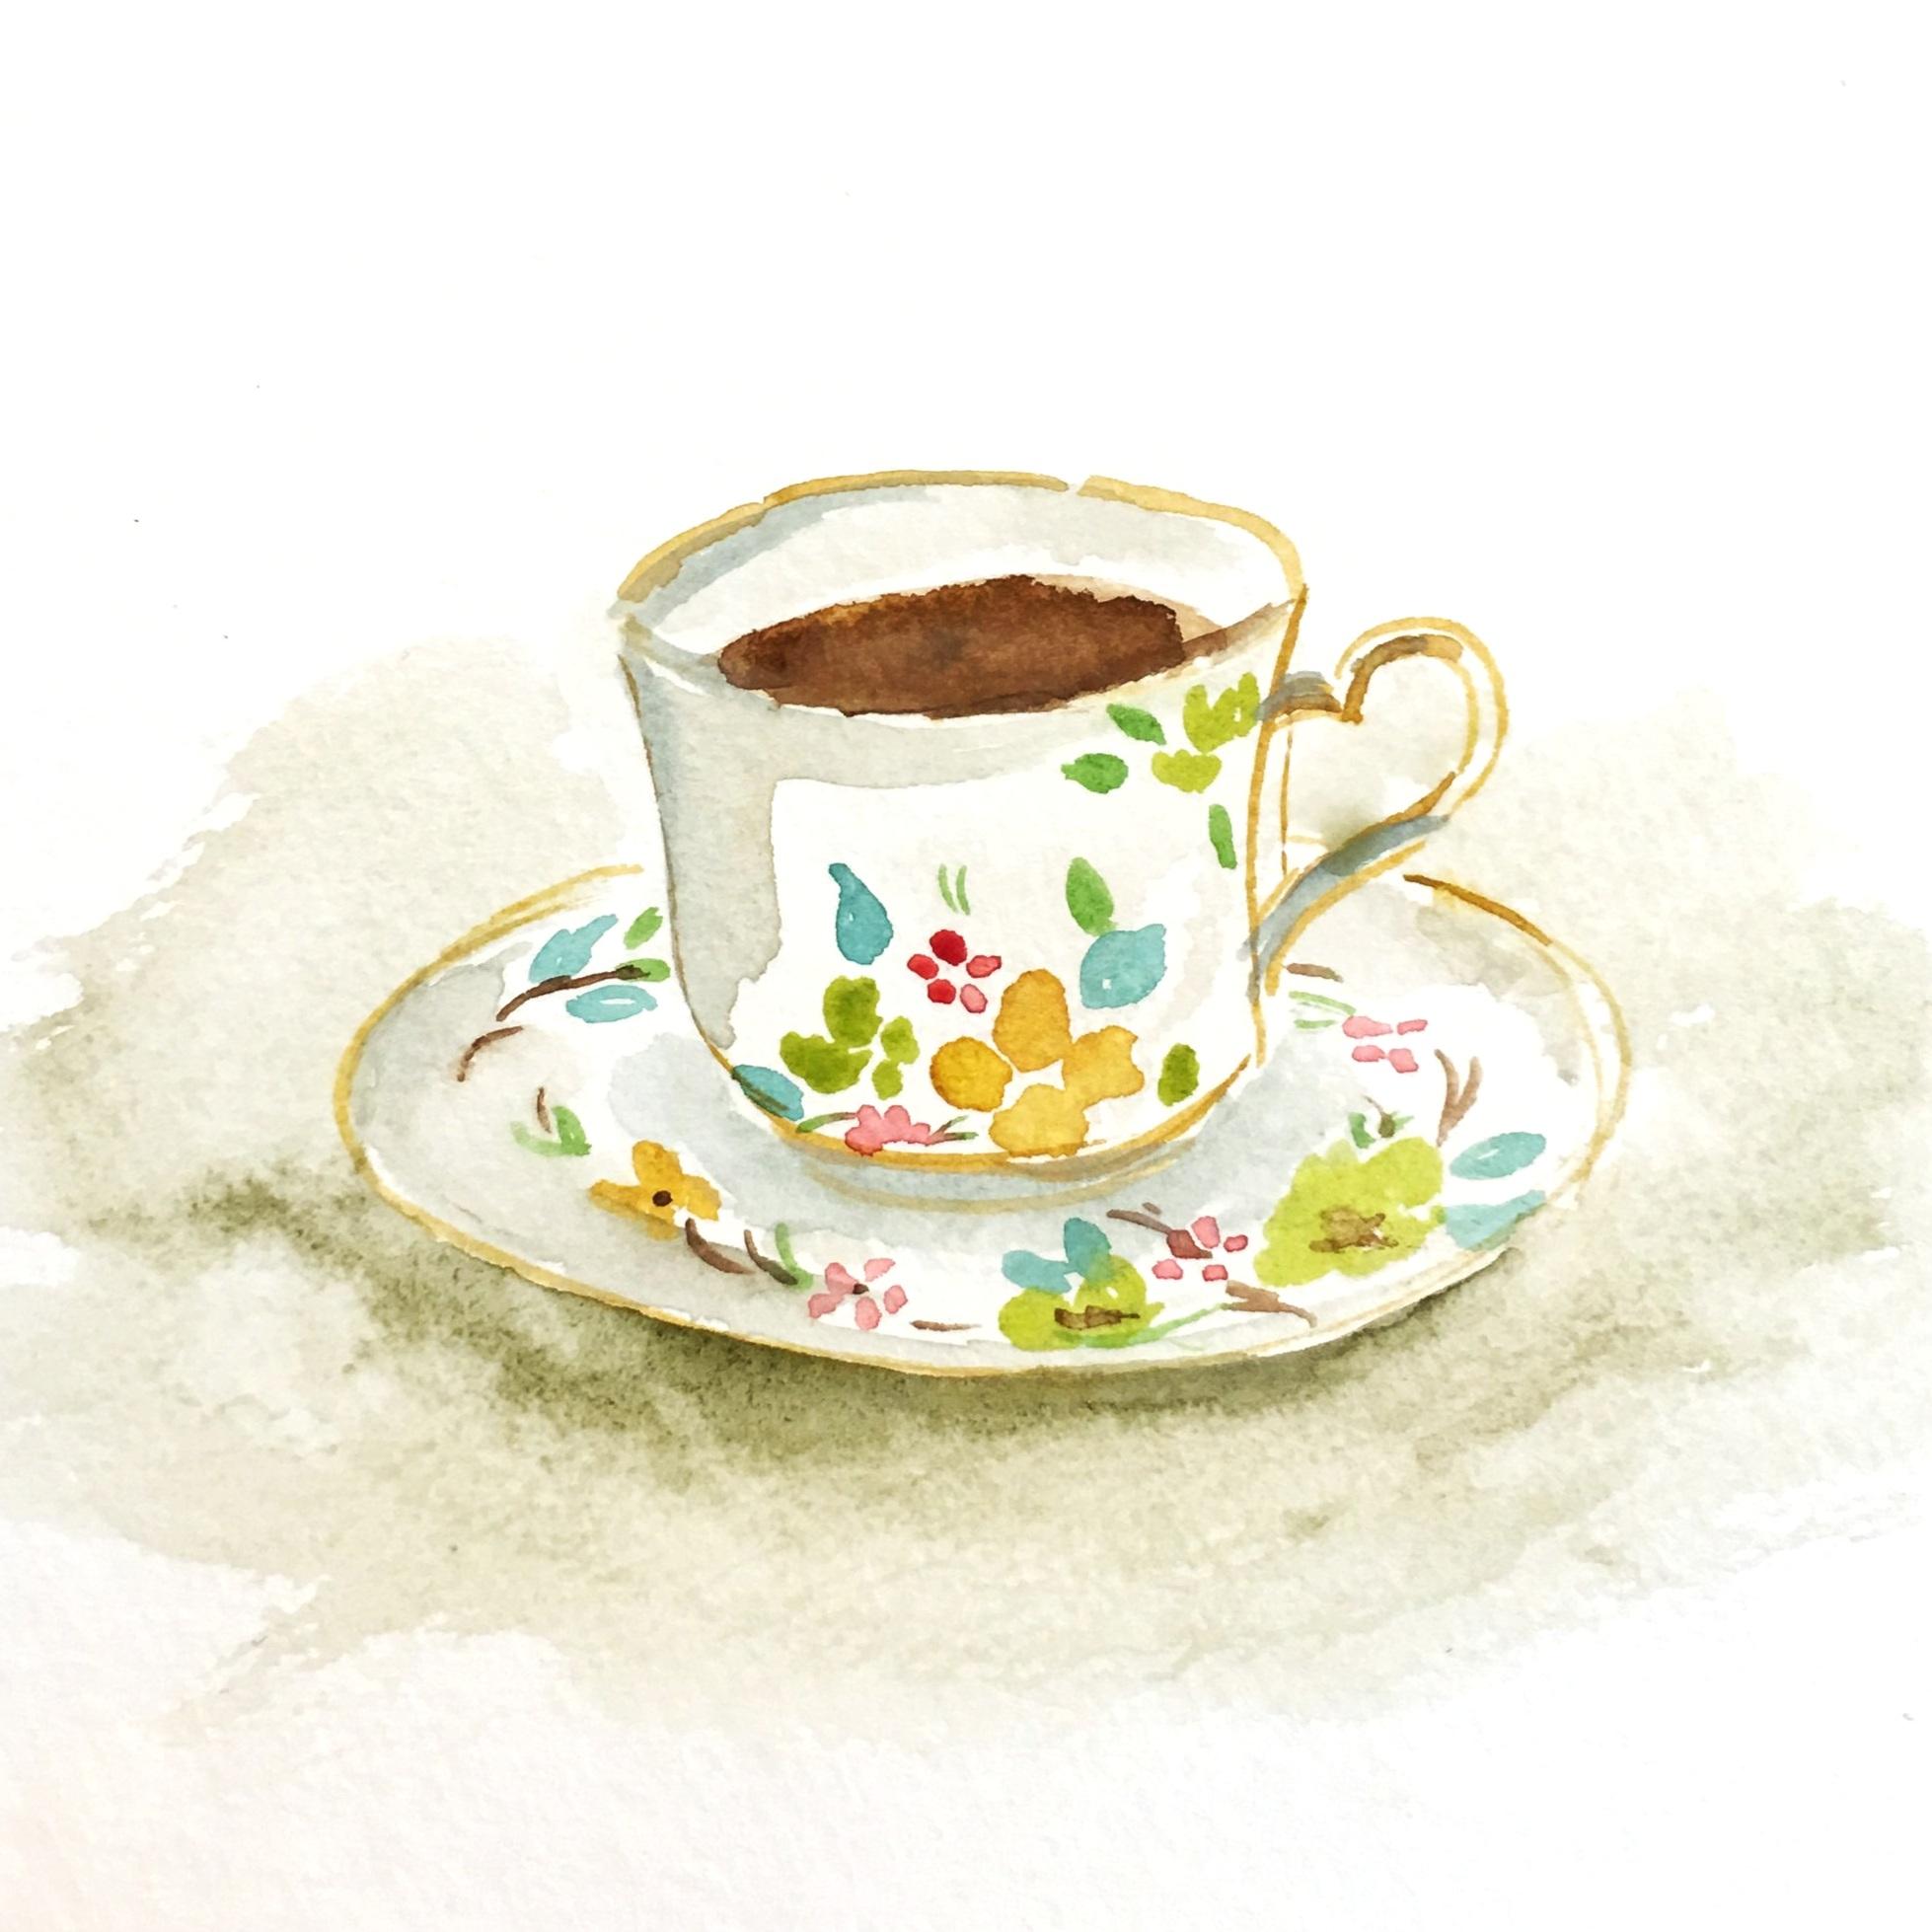 Teacup 2017  Watercolor